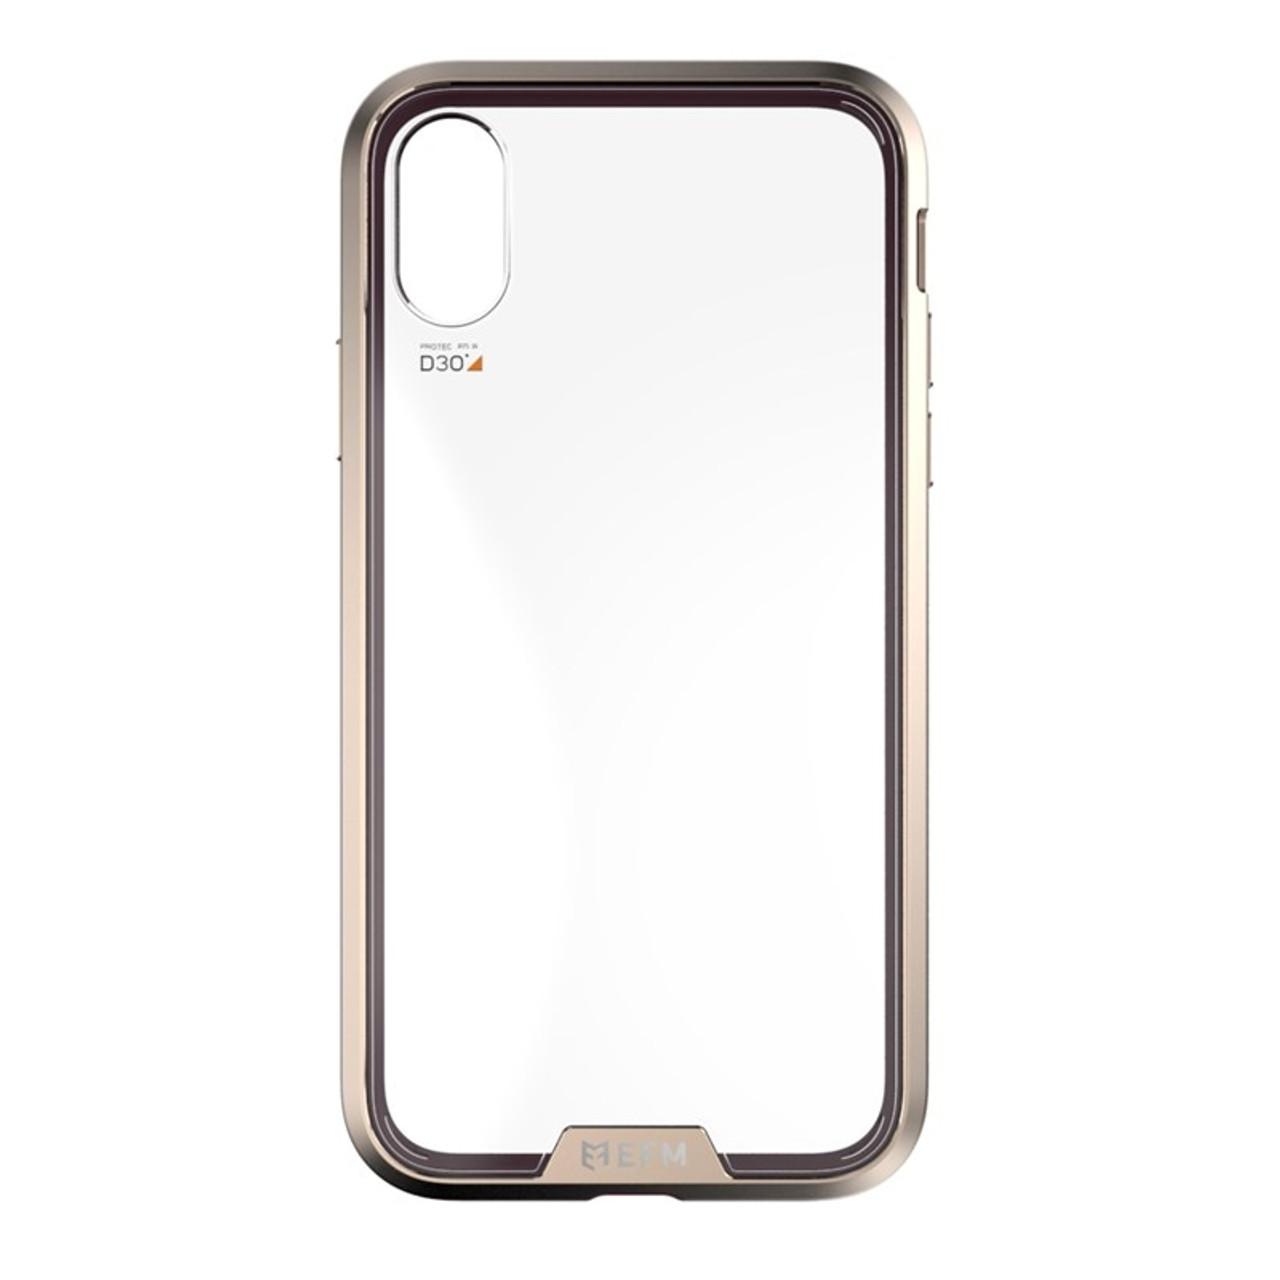 d30 iphone xs max case